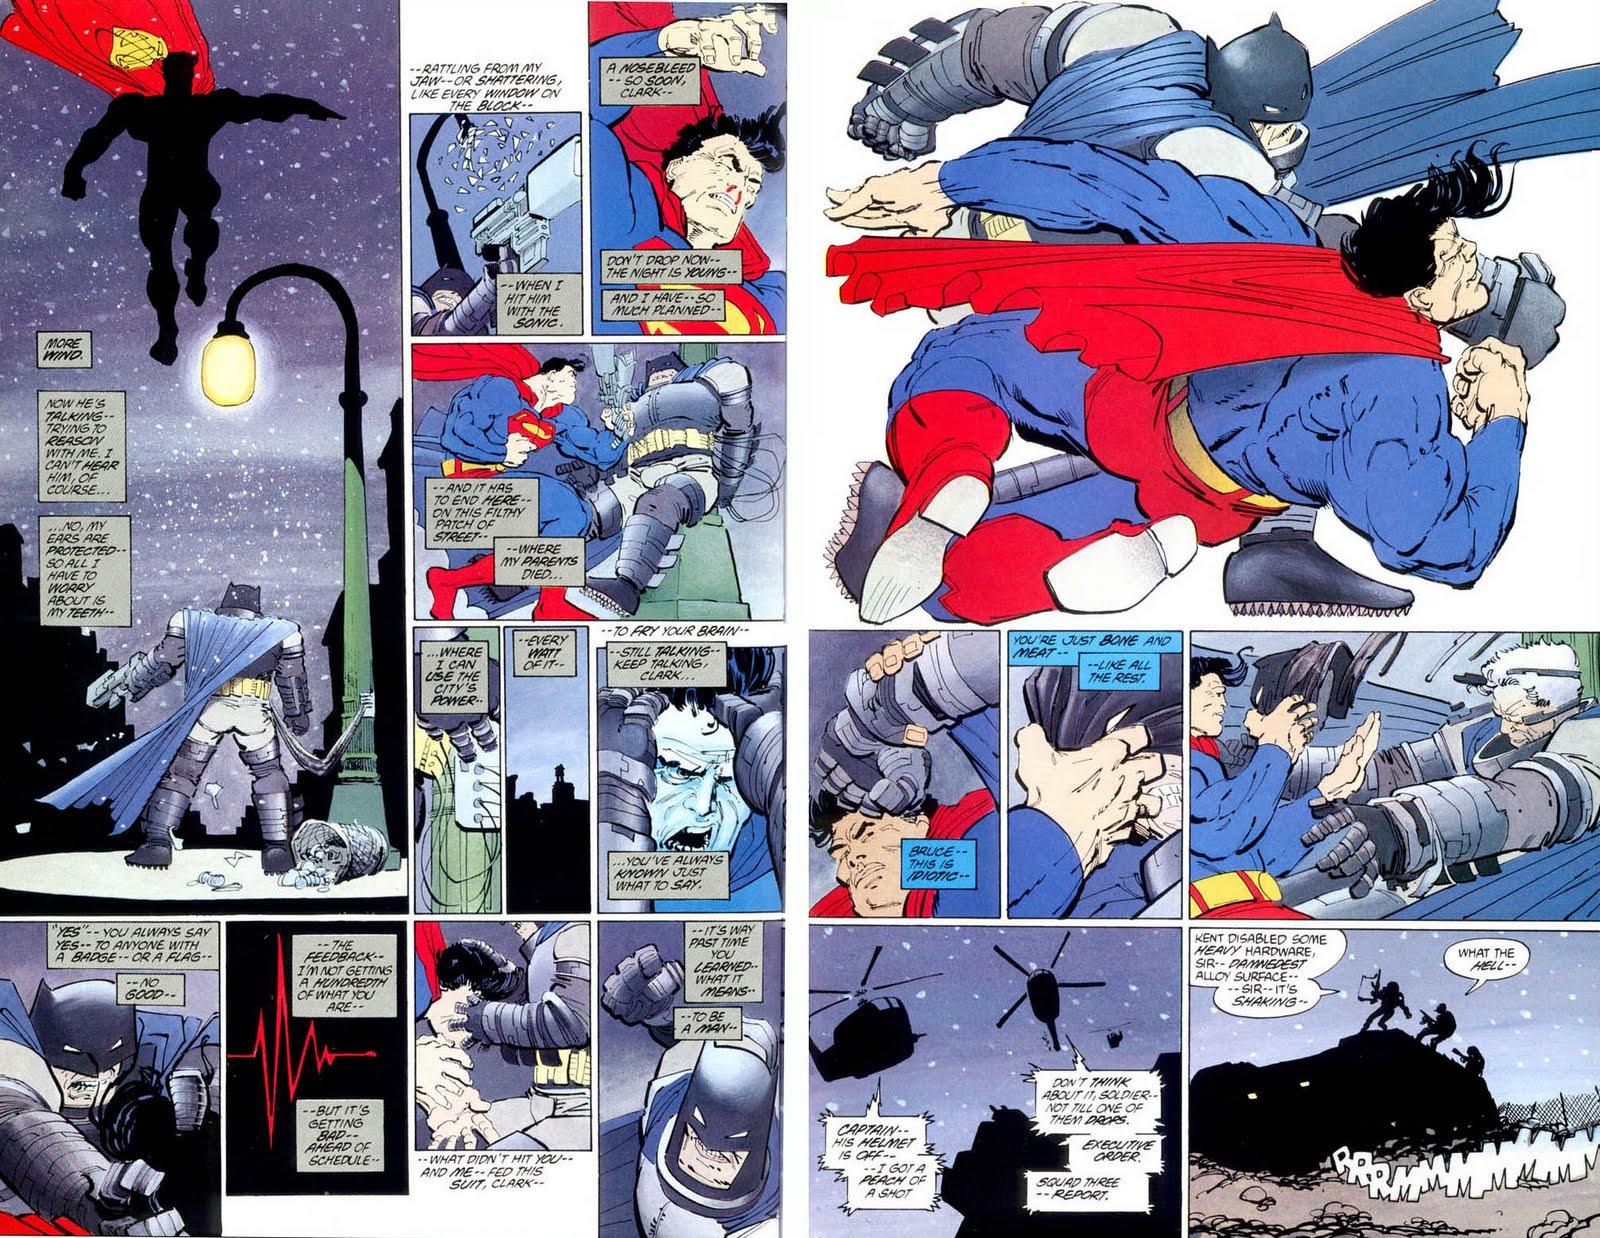 Dark knight Returns batman v superman opinion dc comics news